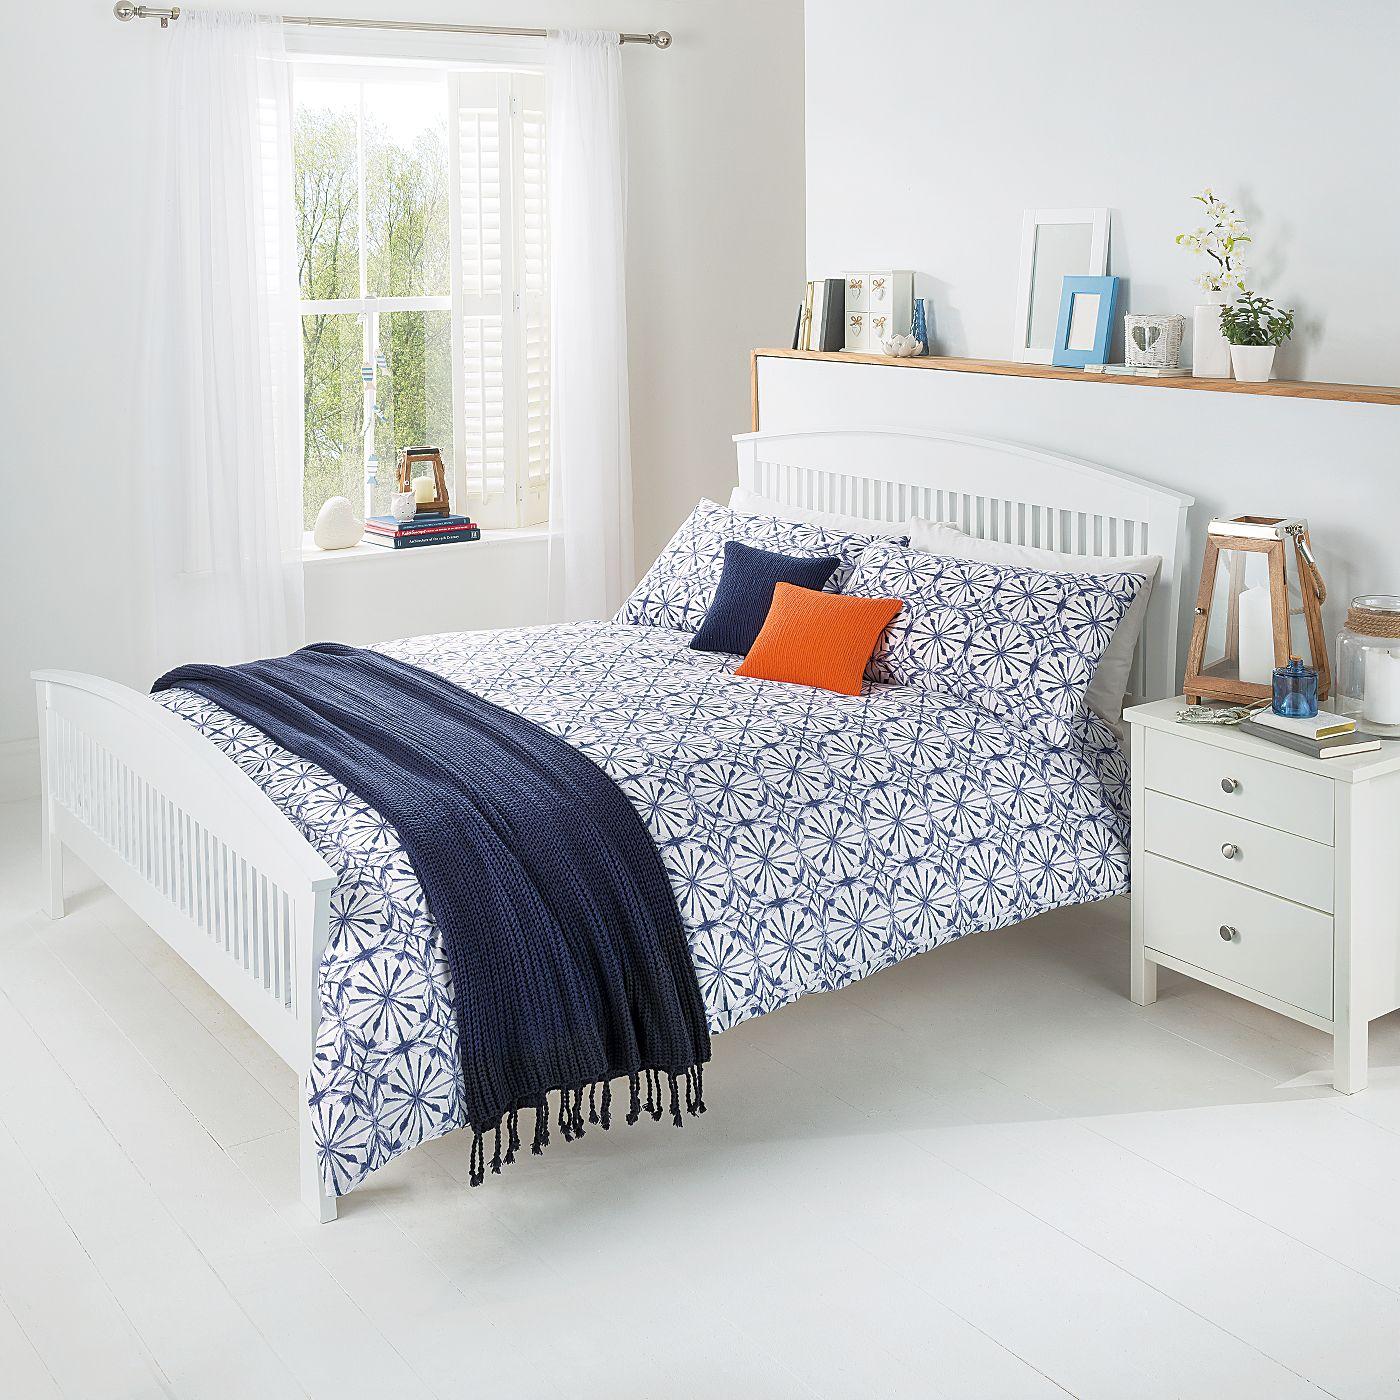 14.00 ASDA George Home Tile Print Duvet Range | Bedding | ASDA ...